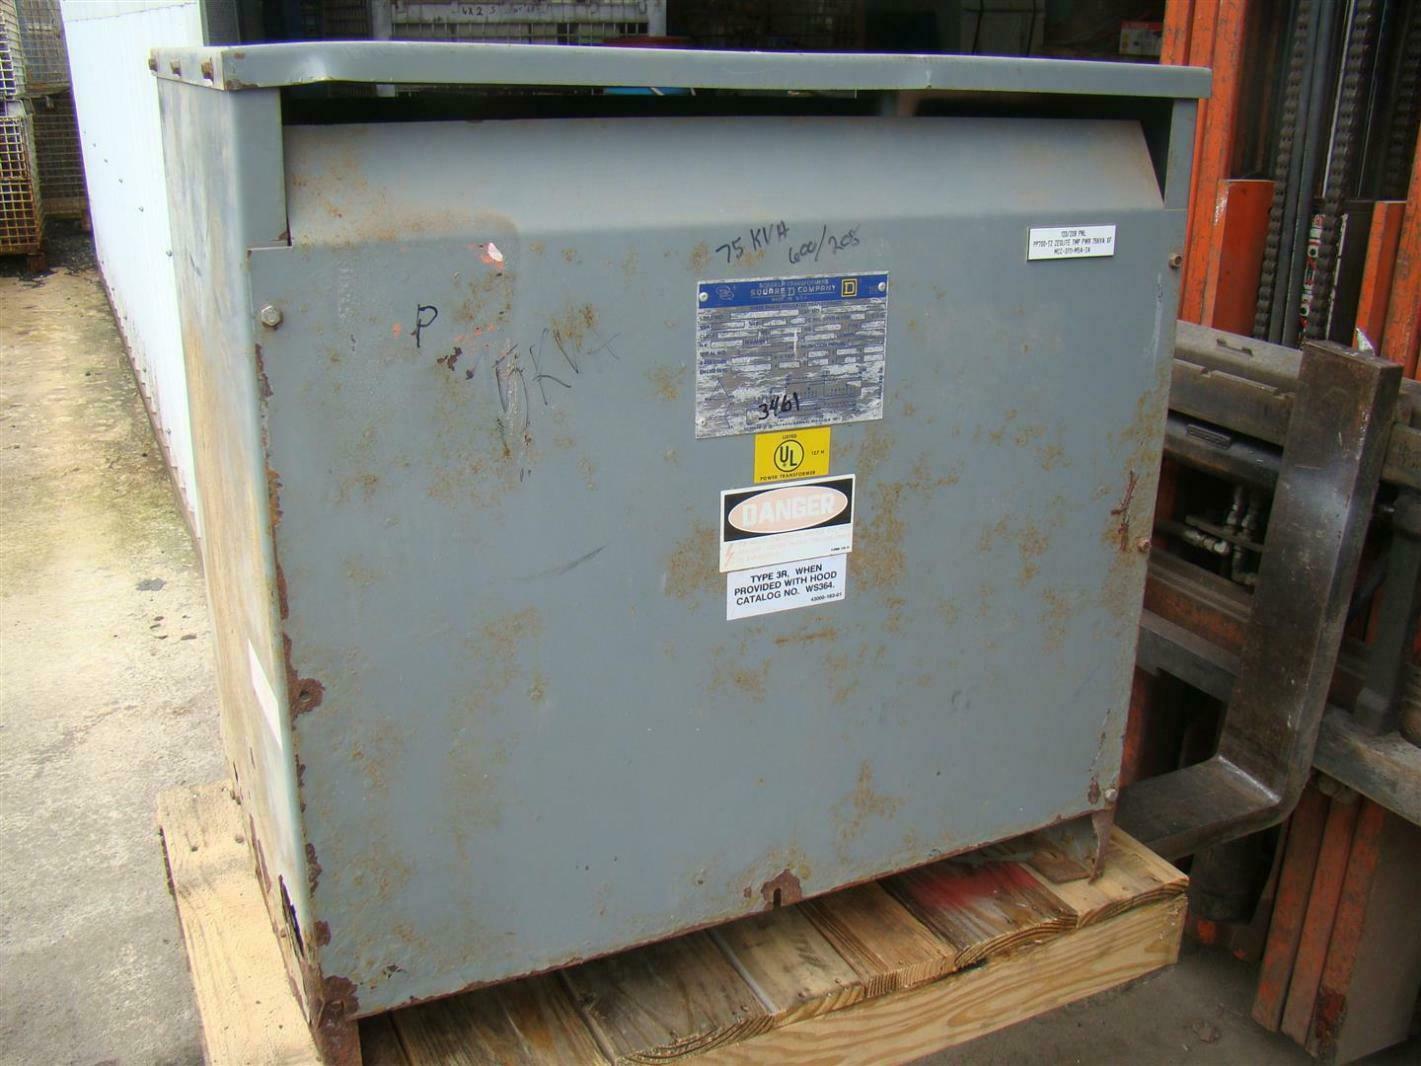 Details About Square D 3 Phase 75 KVA Transformer 600x208Y 120 Volt 75T8H 34360 17312 010